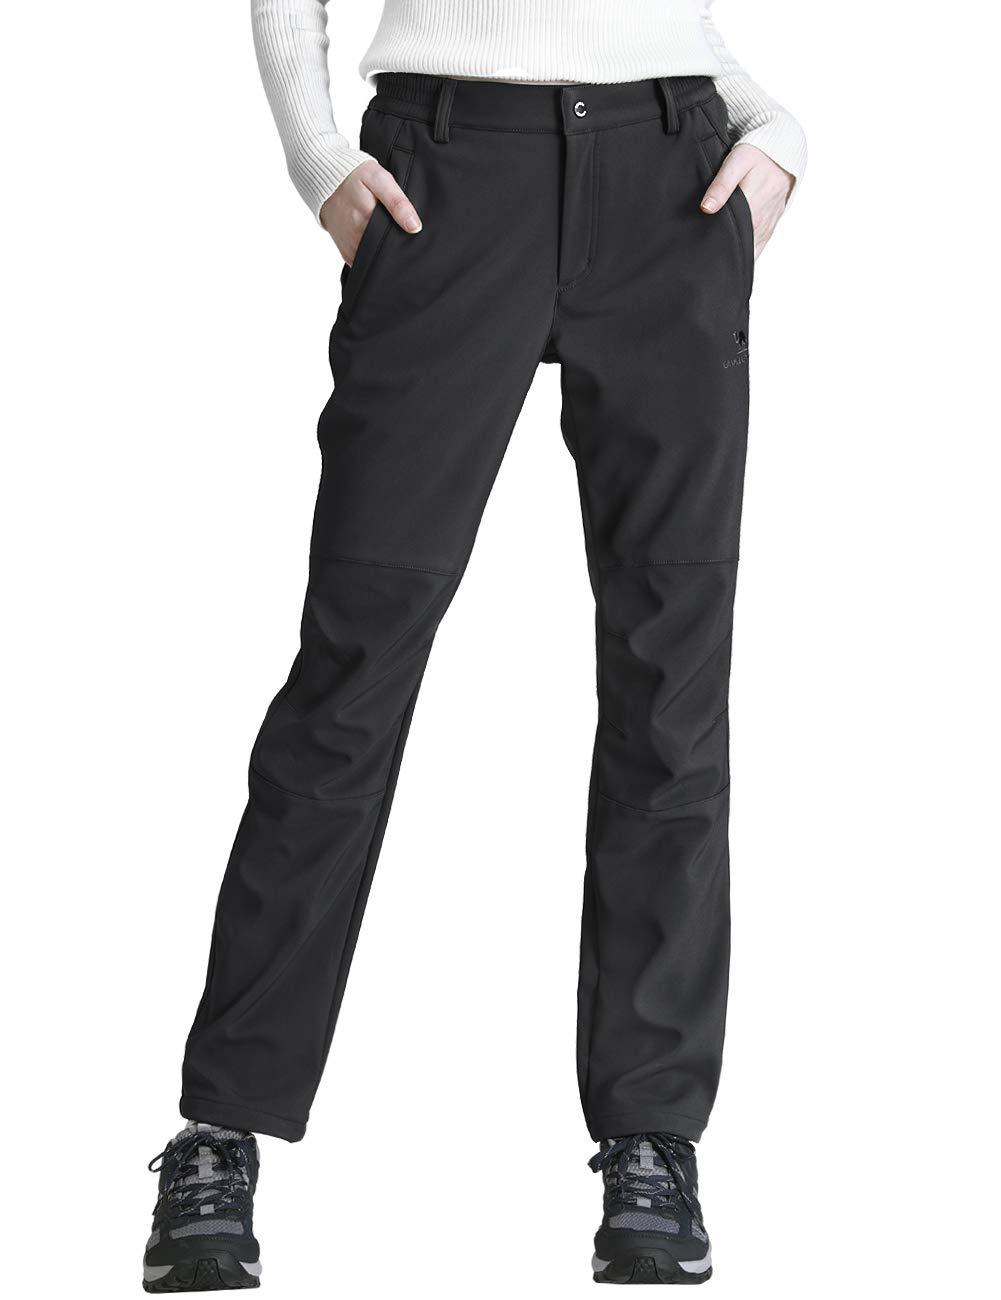 fd7ca0d7728f0 WHG CAMEL CROWN Women's Softshell Fleece Pants for Outdoor Hunting Hiking  Skiing Waterproof Windproof Trousers